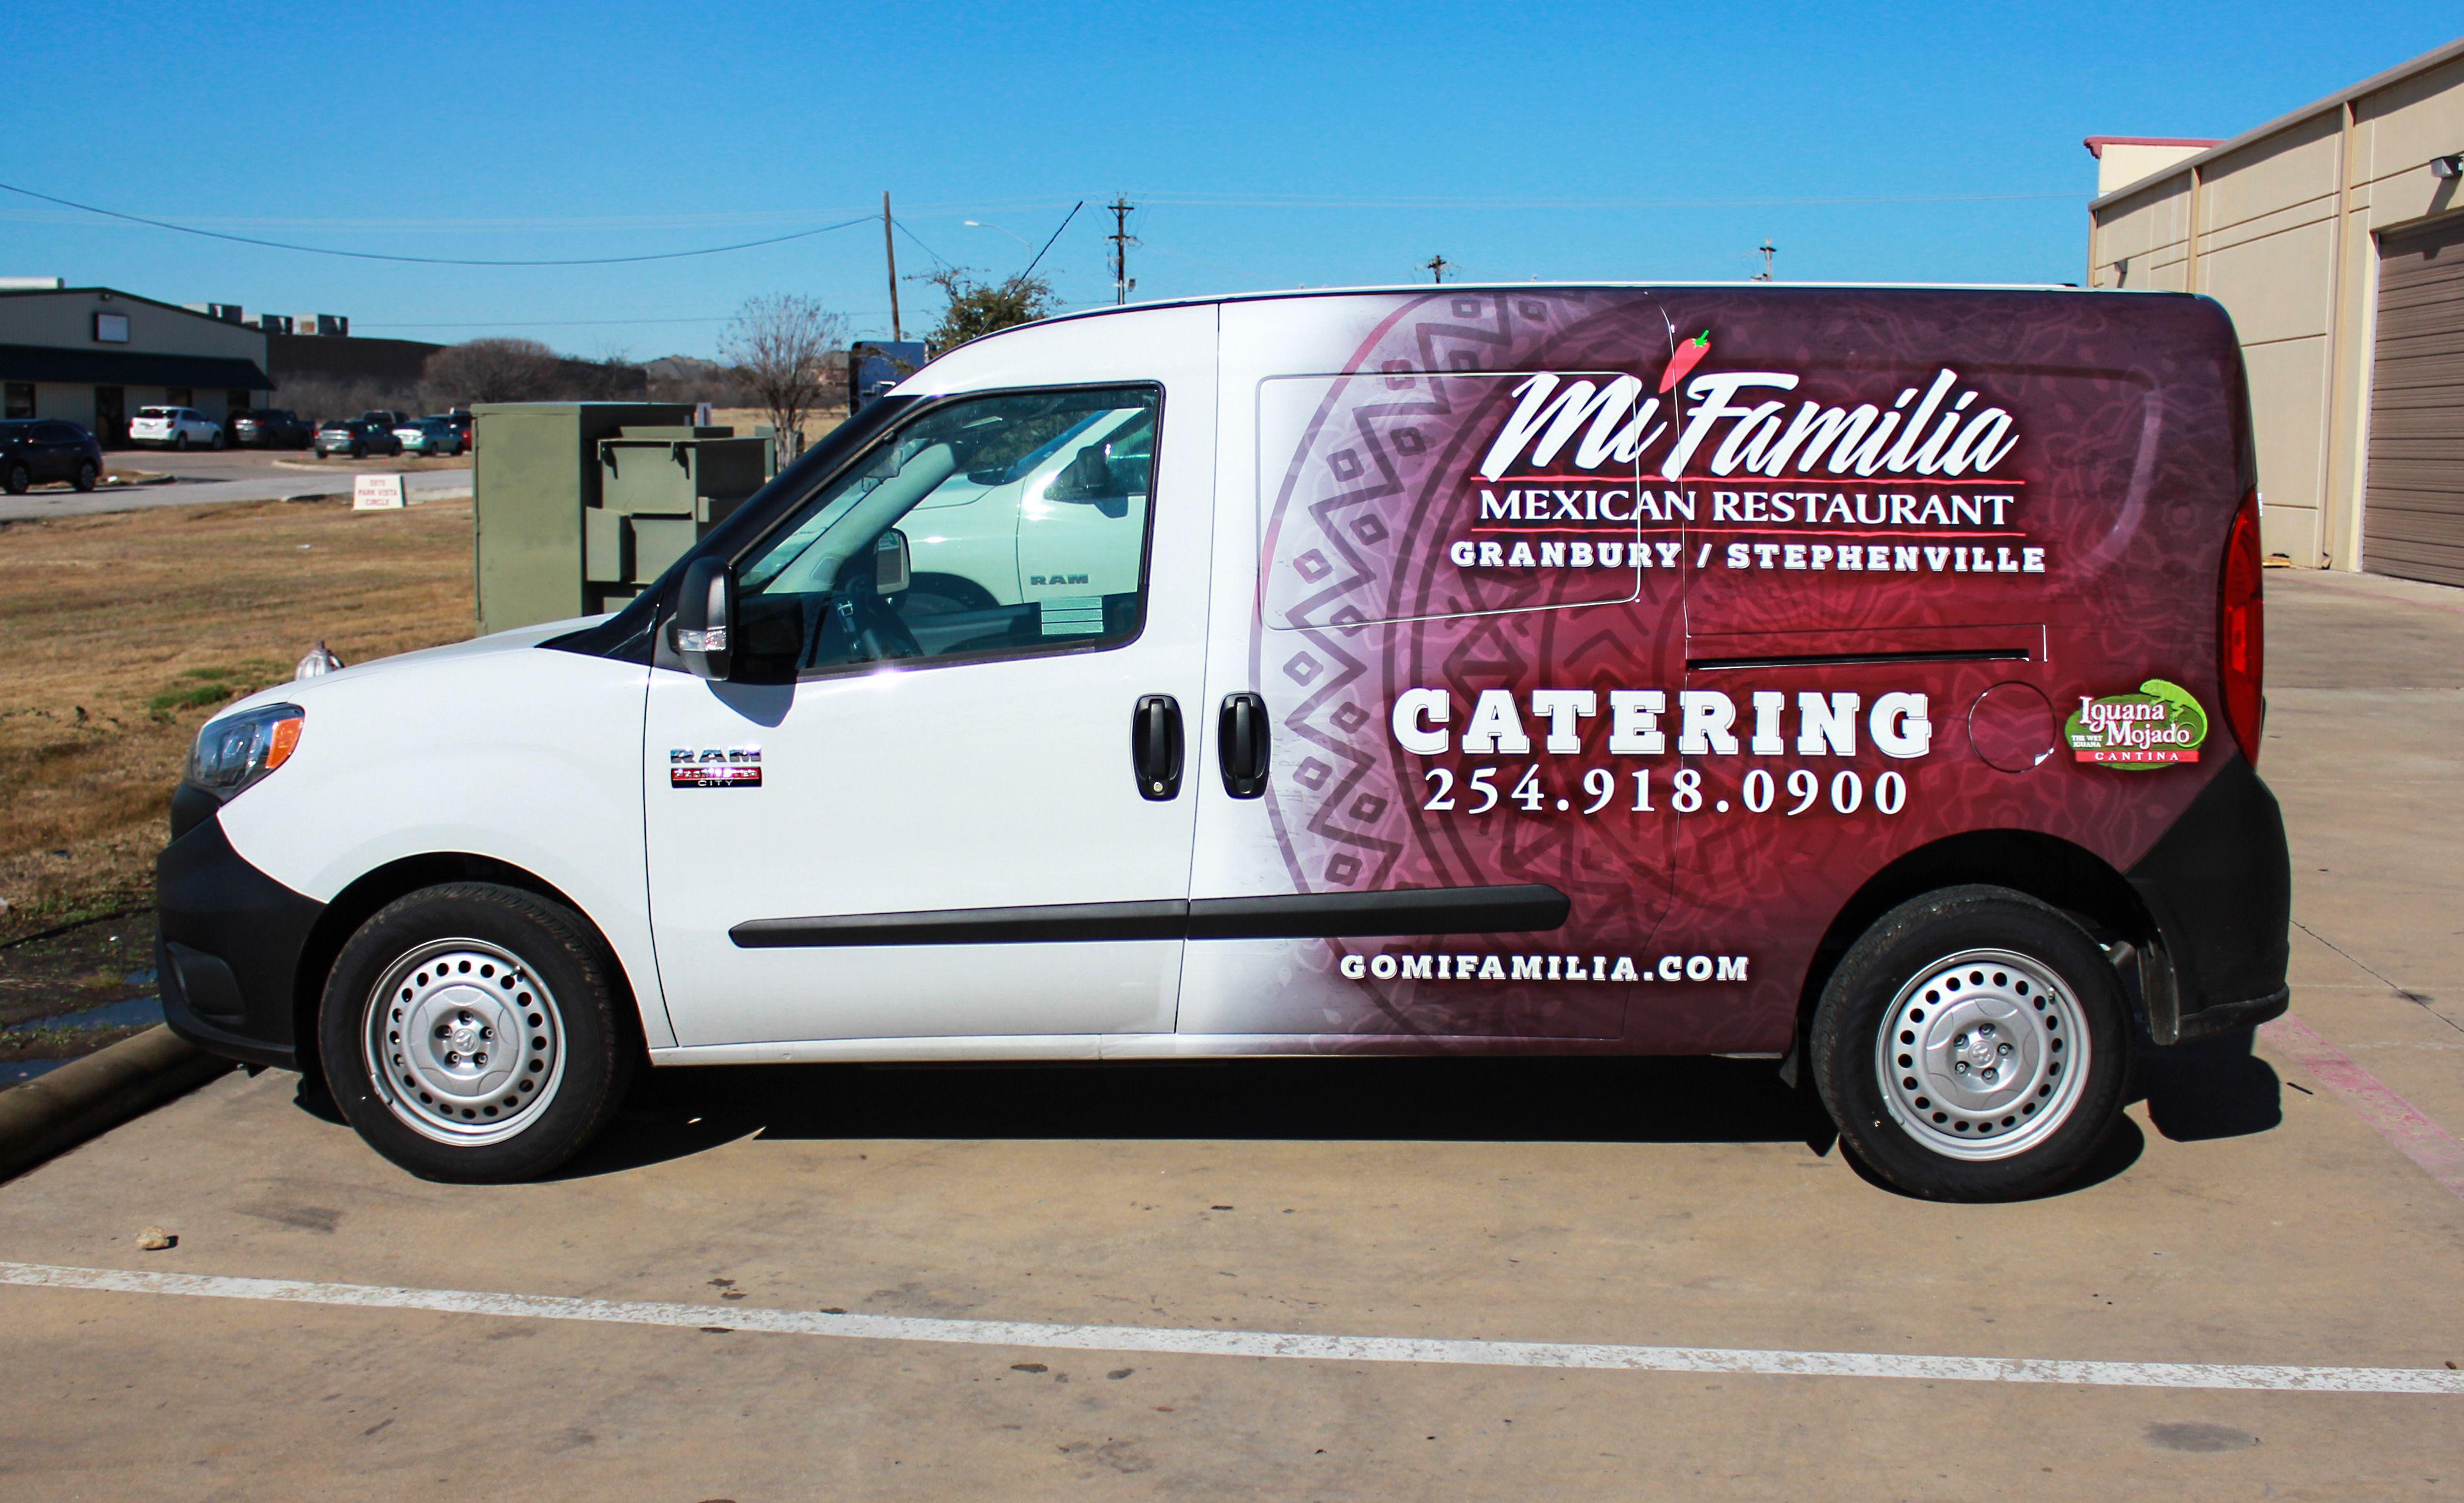 Catering Van Ideas Mexican Food Aztec Van Wrap Design Granbury